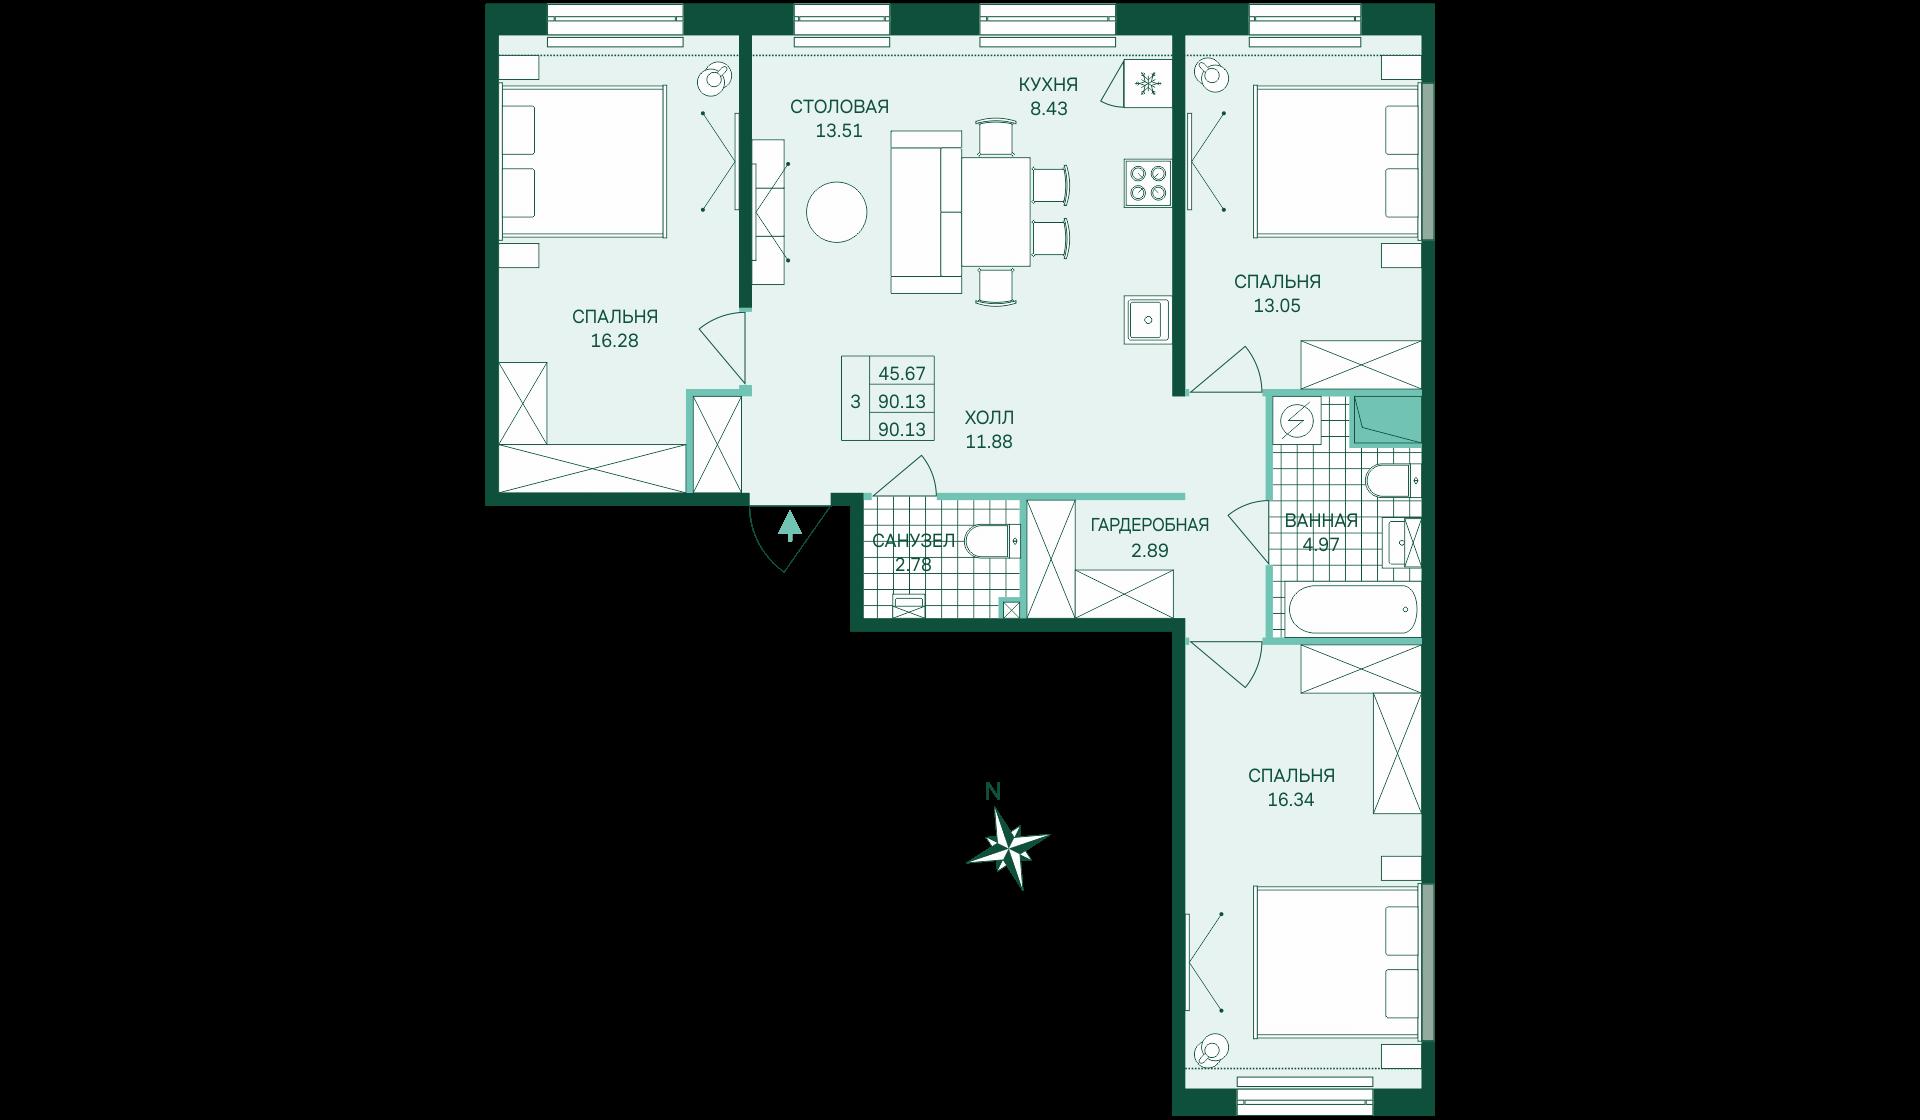 Планировка Трёхкомнатная квартира площадью 90.13 кв.м в ЖК «Skandi Klubb»